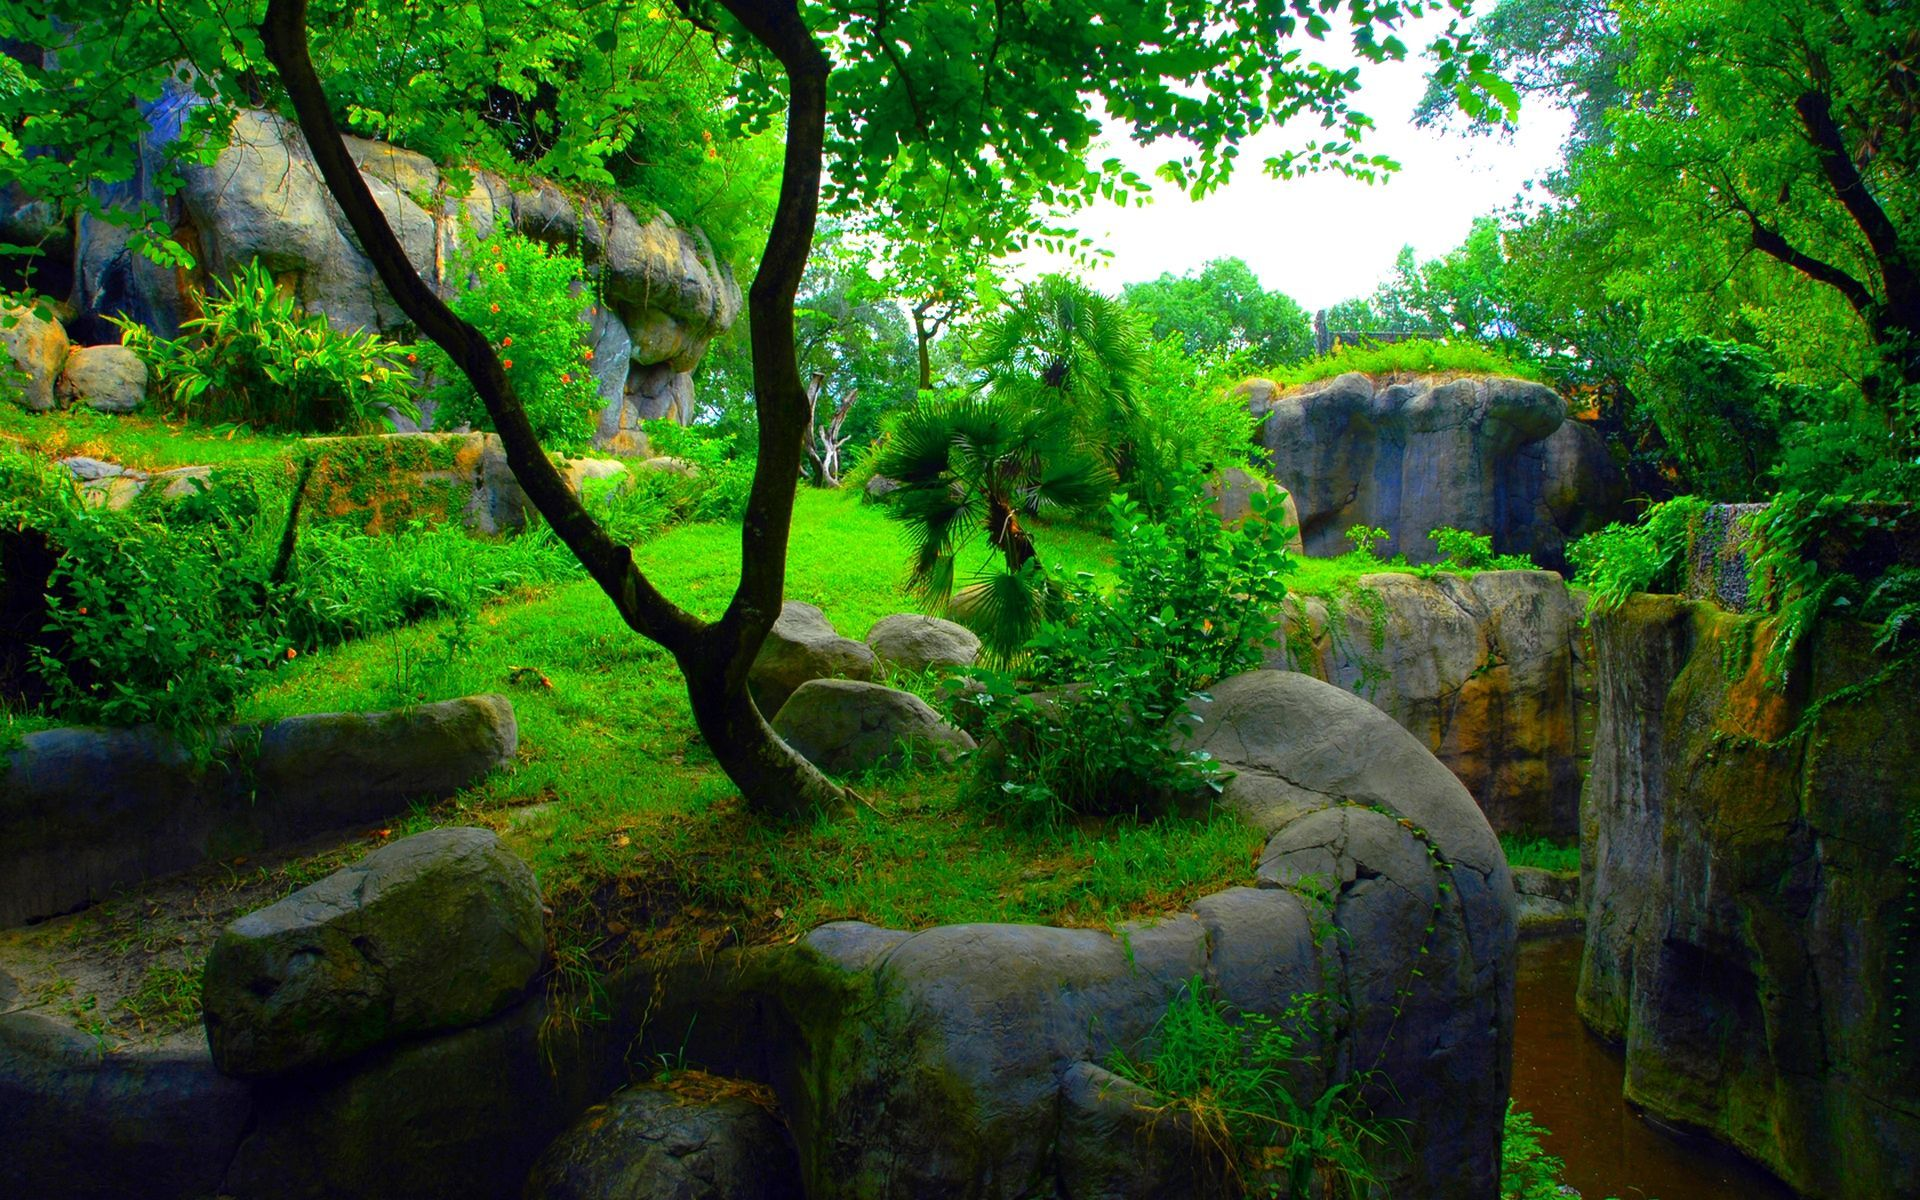 3d Nature Desktop Hd Wallpaper Nature Wallpaper Green Nature Wallpaper Wallpaper Pc